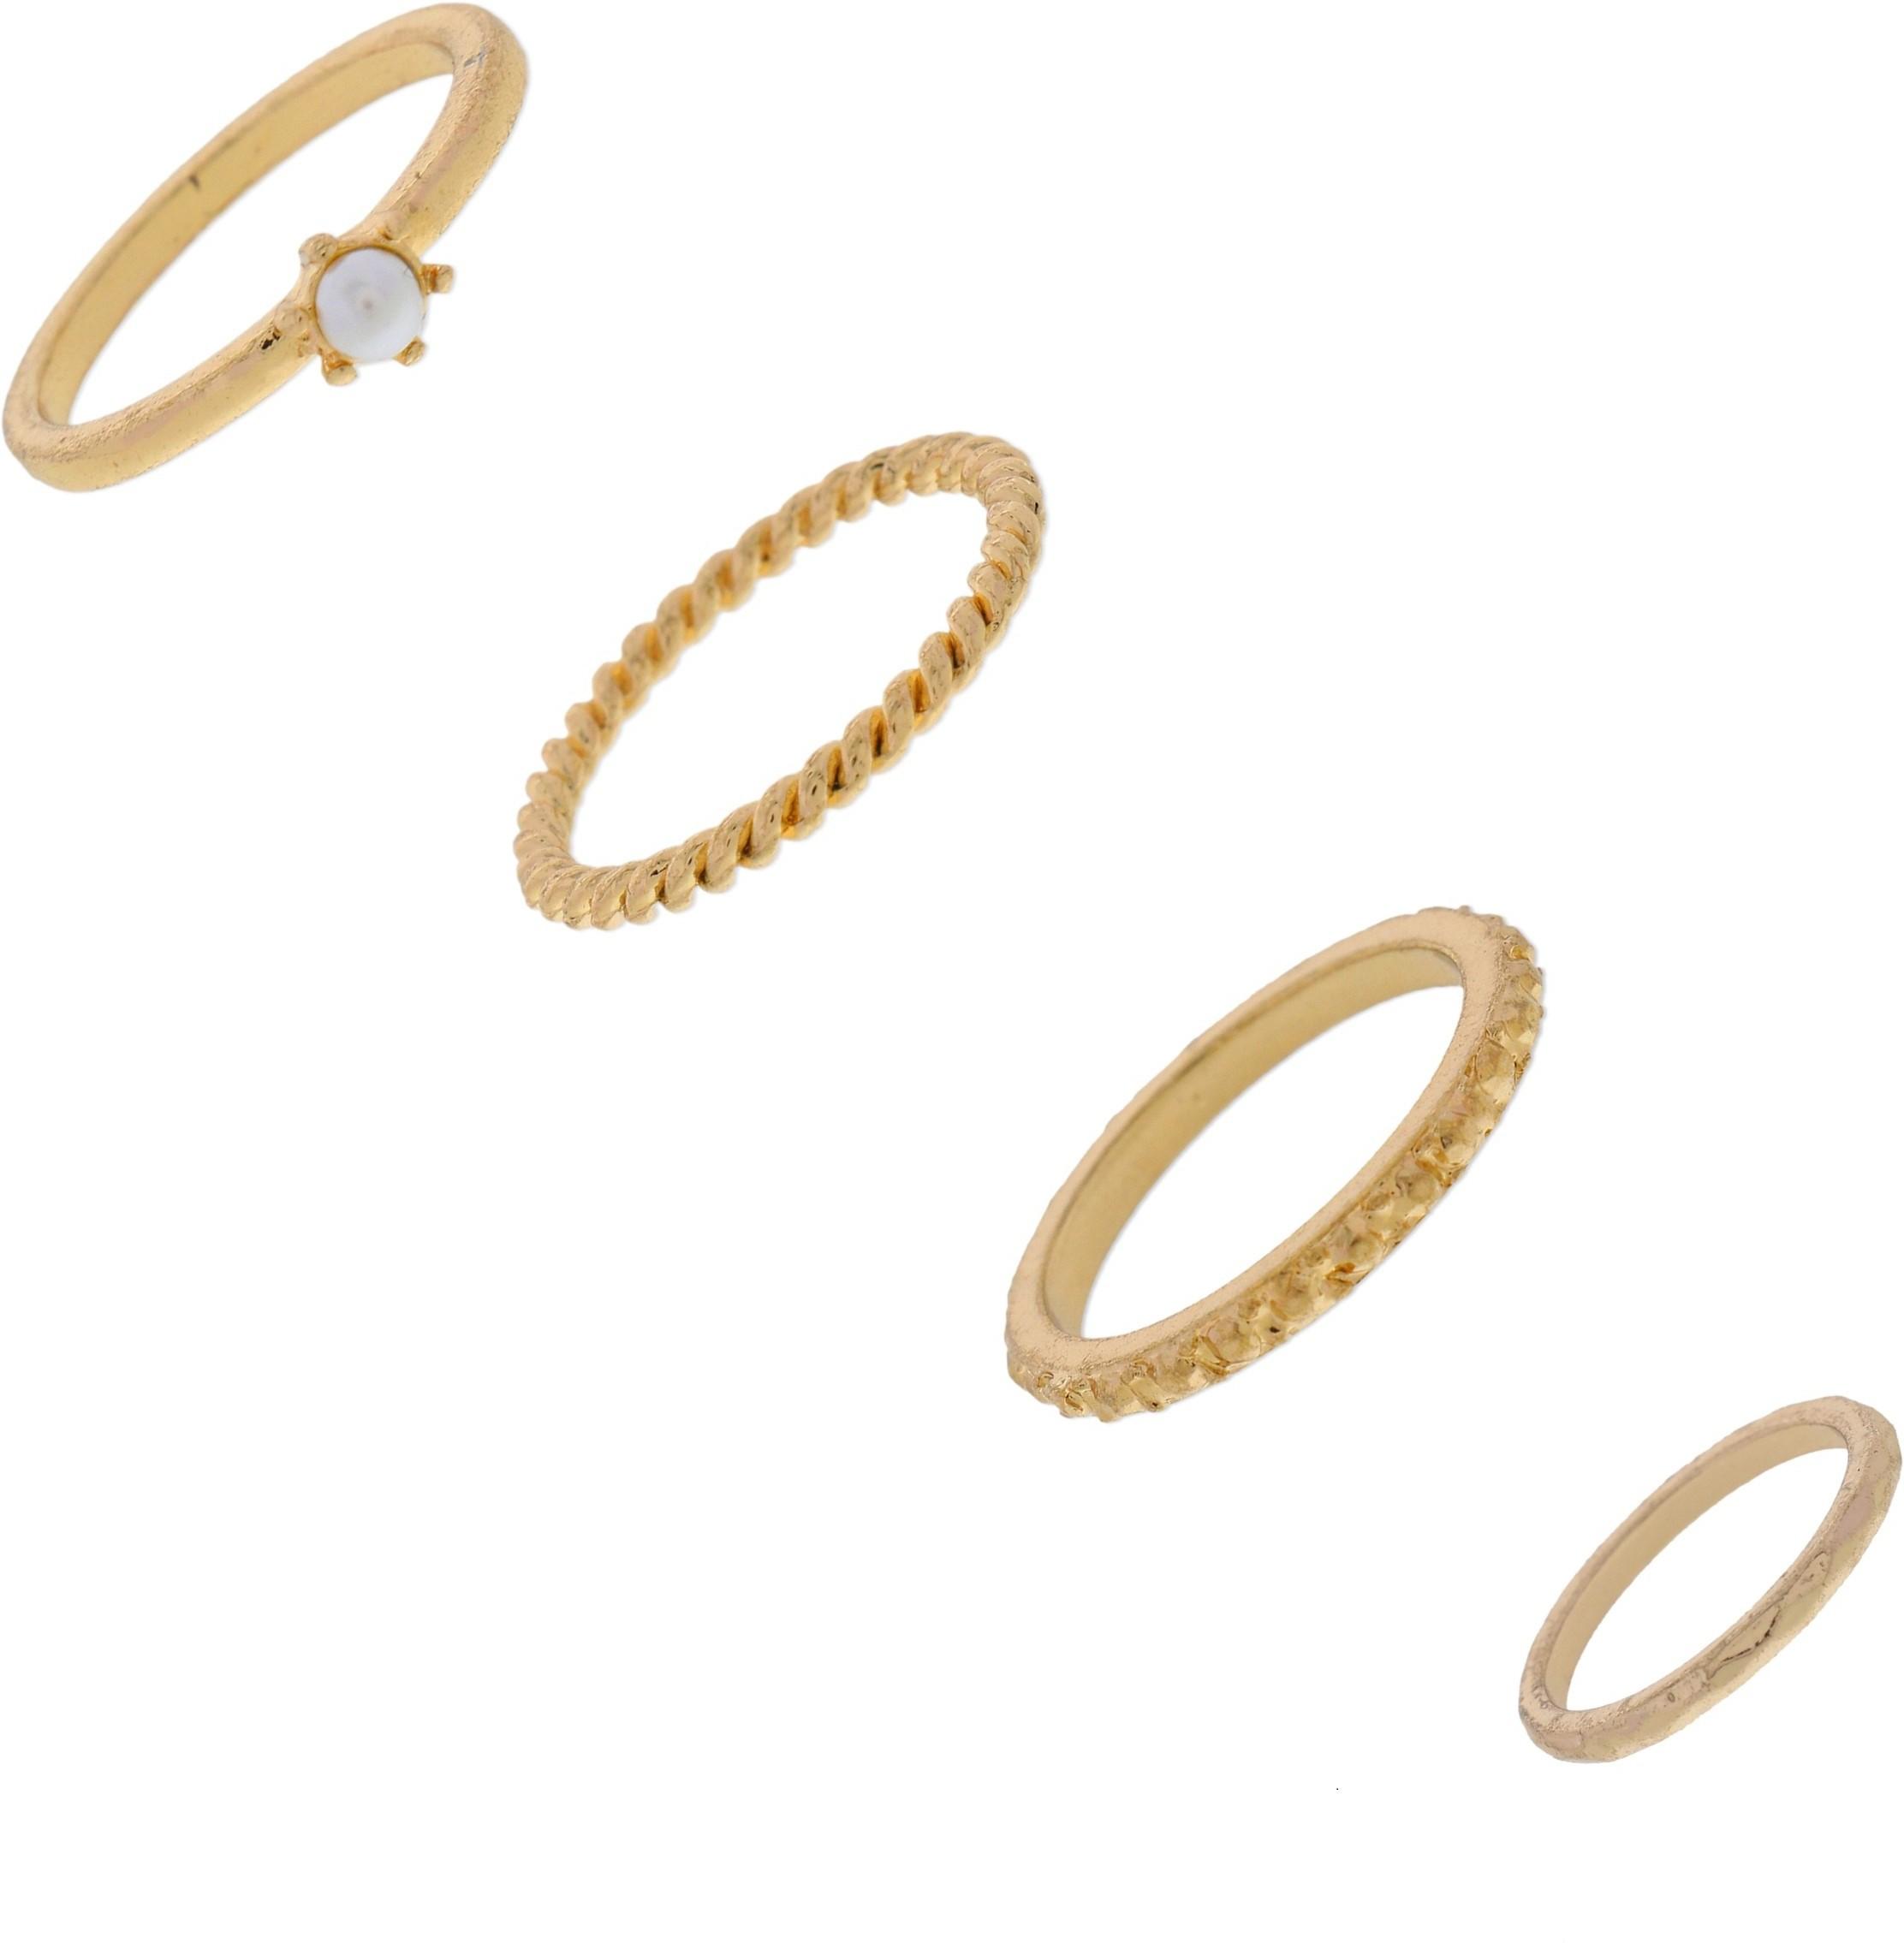 Deals - Delhi - Stacked Rings <br> Trendy Jewellery<br> Category - jewellery<br> Business - Flipkart.com